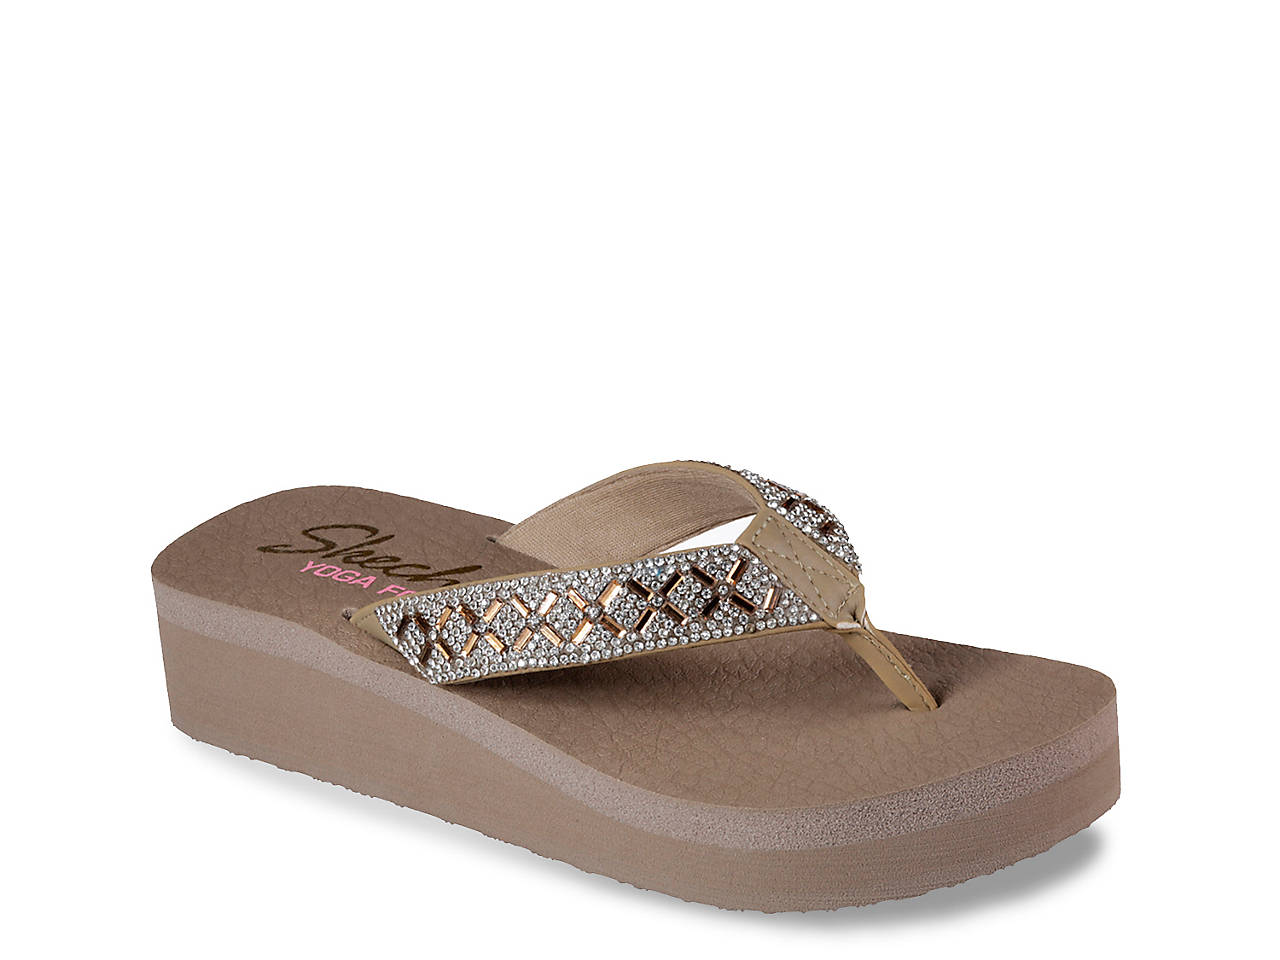 fec650250bbd Skechers Cali Vinyasa Lotus Princess Wedge Flip Flop Women s Shoes